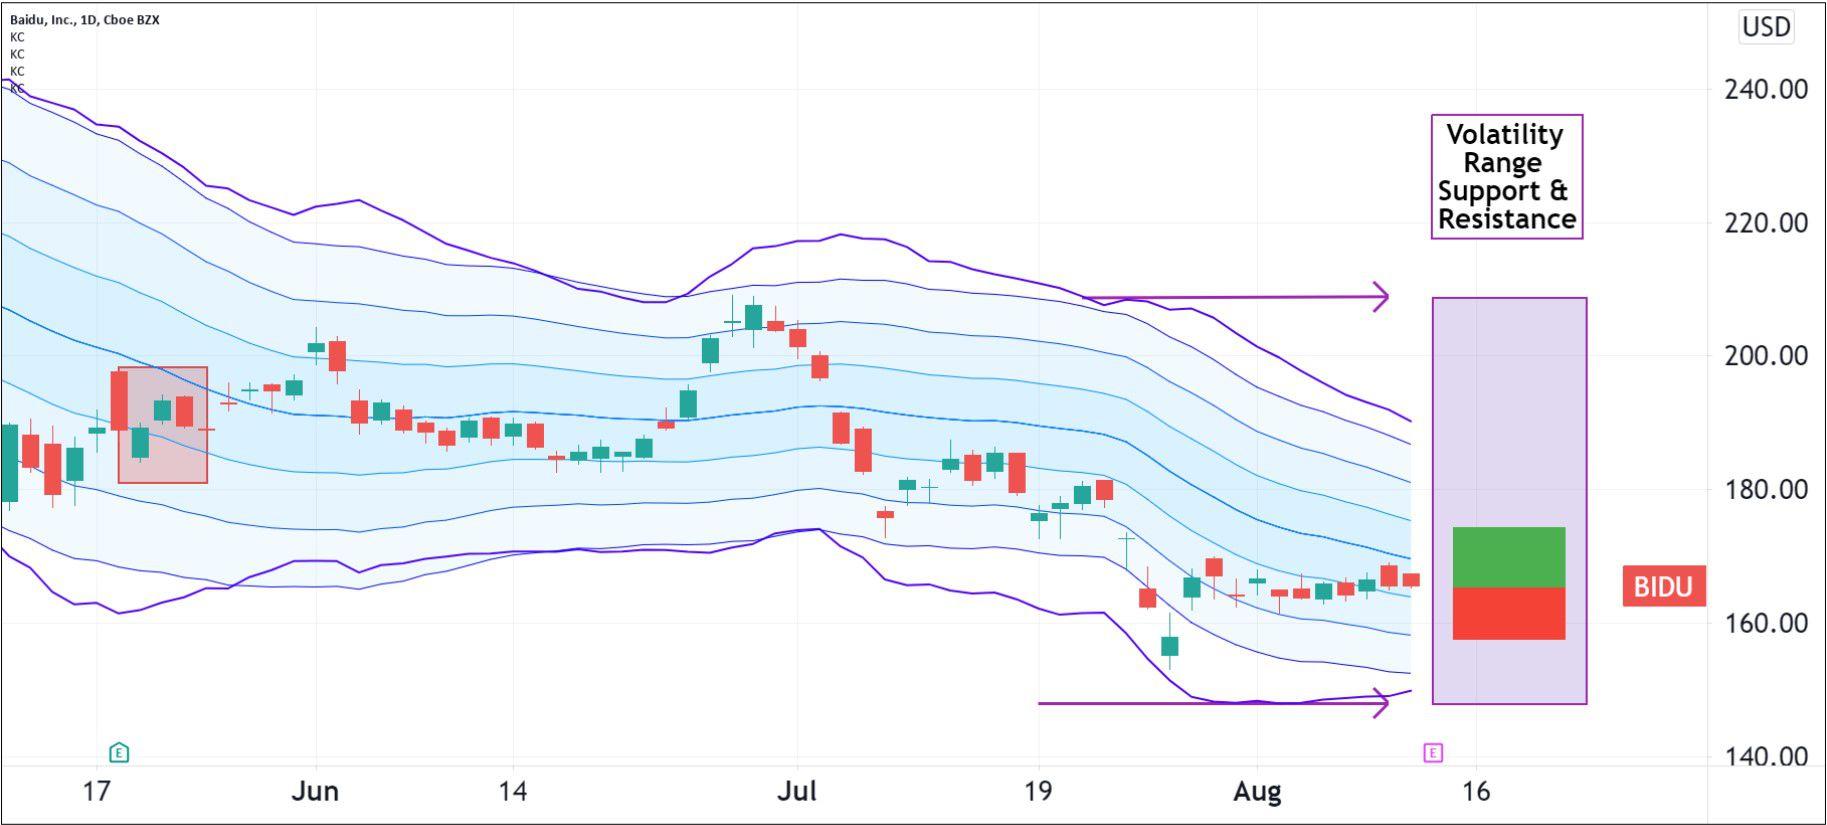 Volatility pattern for Baidu, Inc. (BIDU)